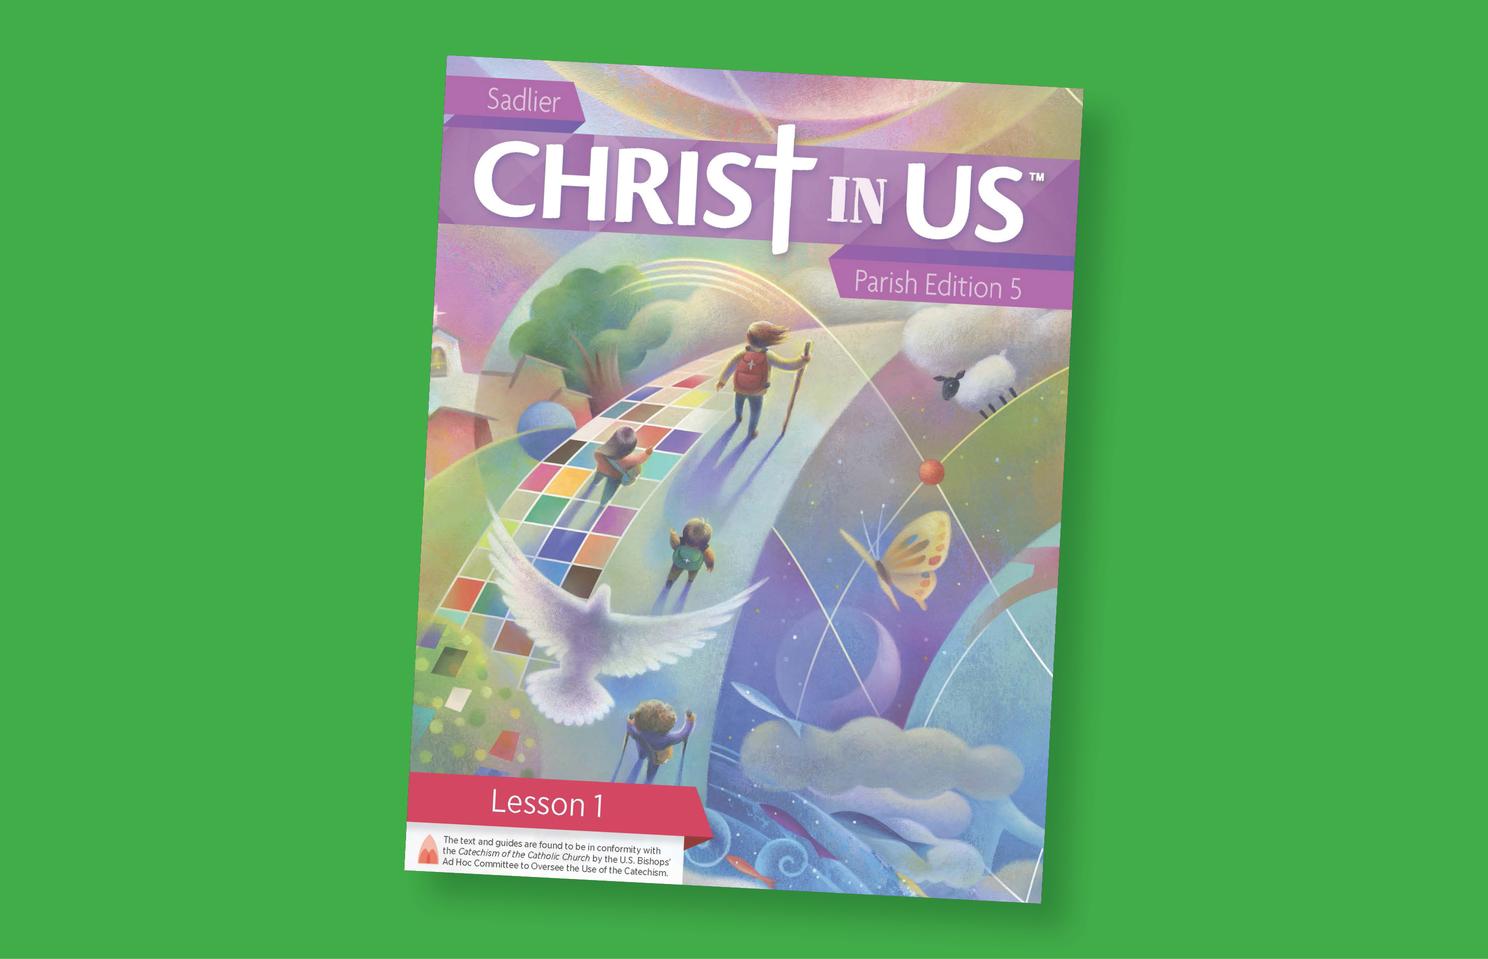 Sadlier Christ in US